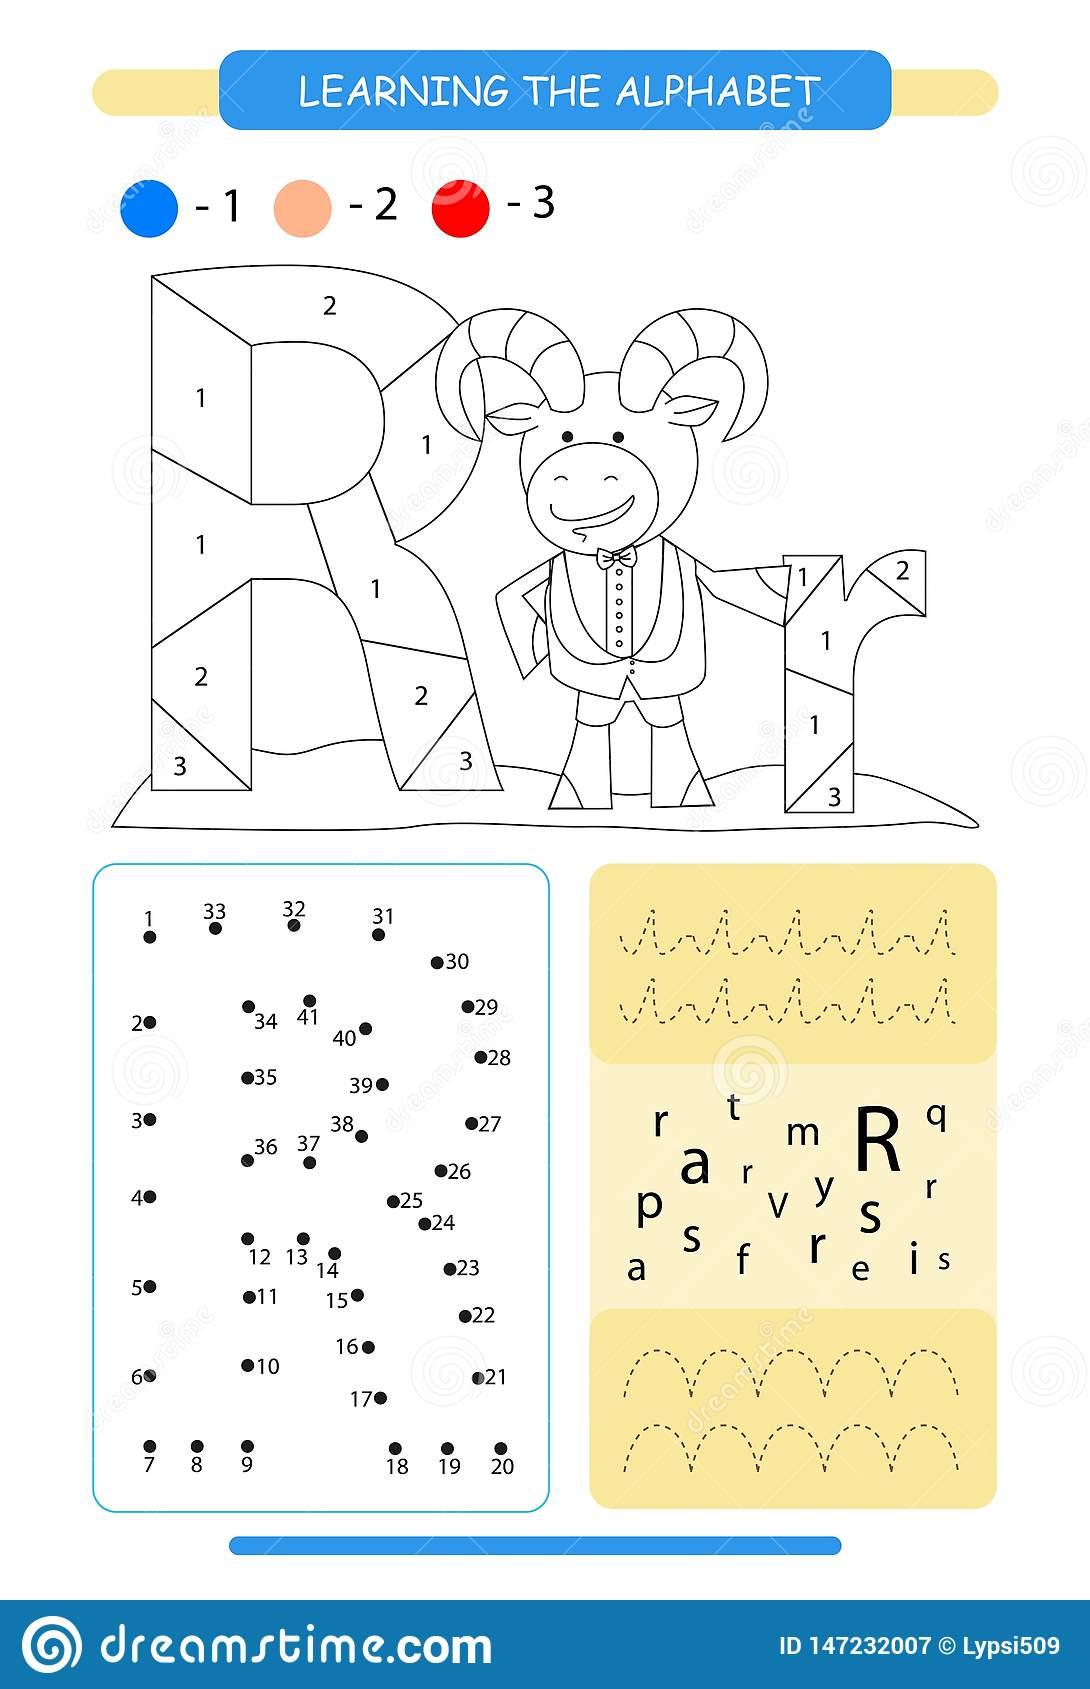 Lettre R Et Ram Dr?le De Bande Dessin?e A-Z D'alphabet D concernant Dessin Lettre E